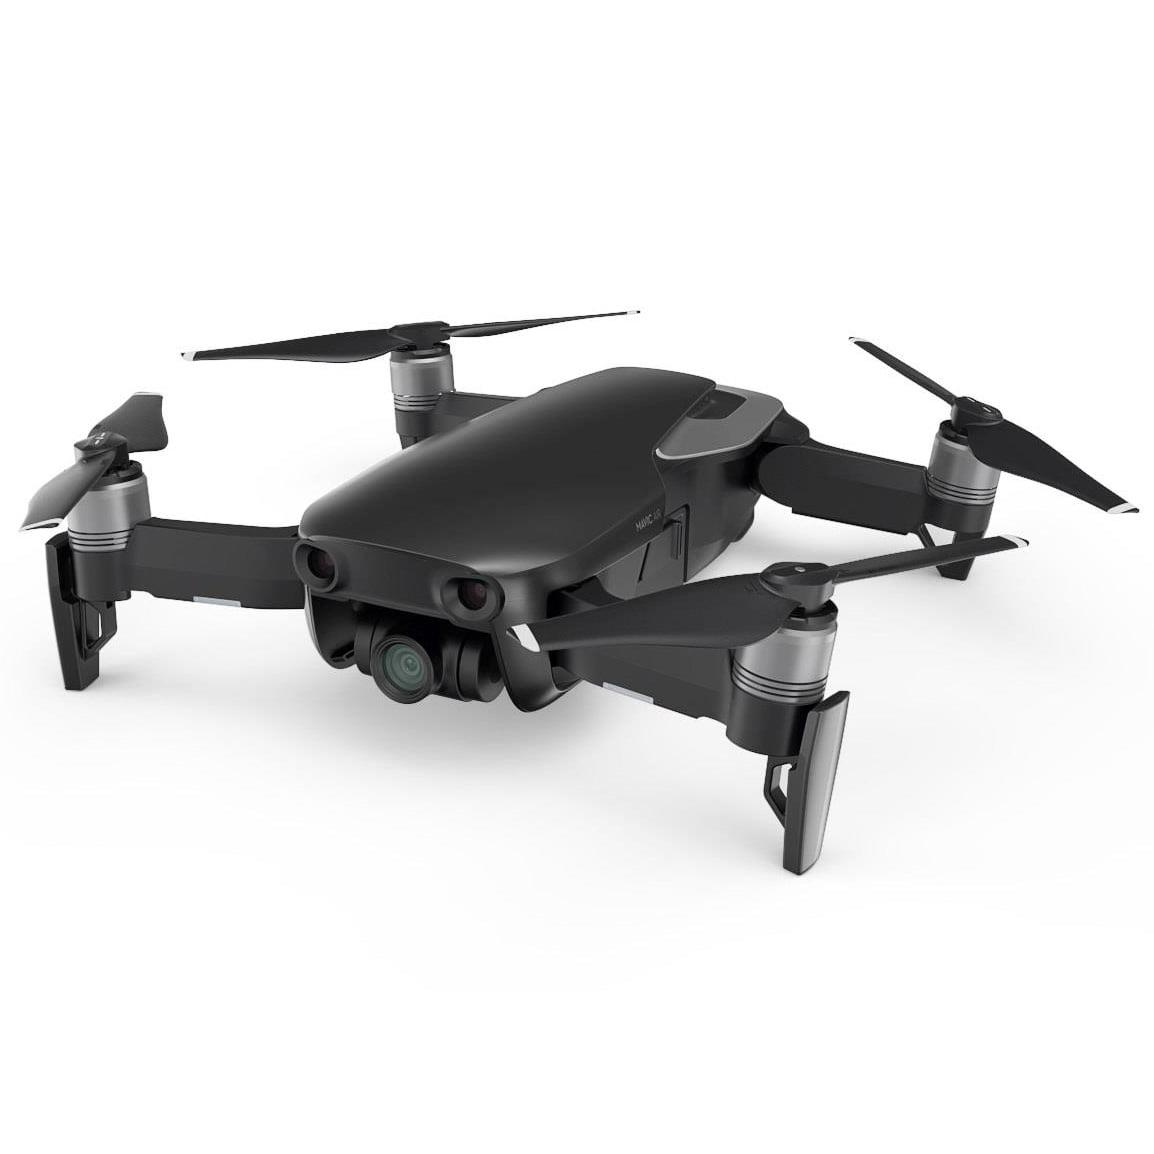 Drona DJI Mavic Air Fly More Combo, UHD 4K, 12MP, Autonomie 21min, 430g, Onyx Black